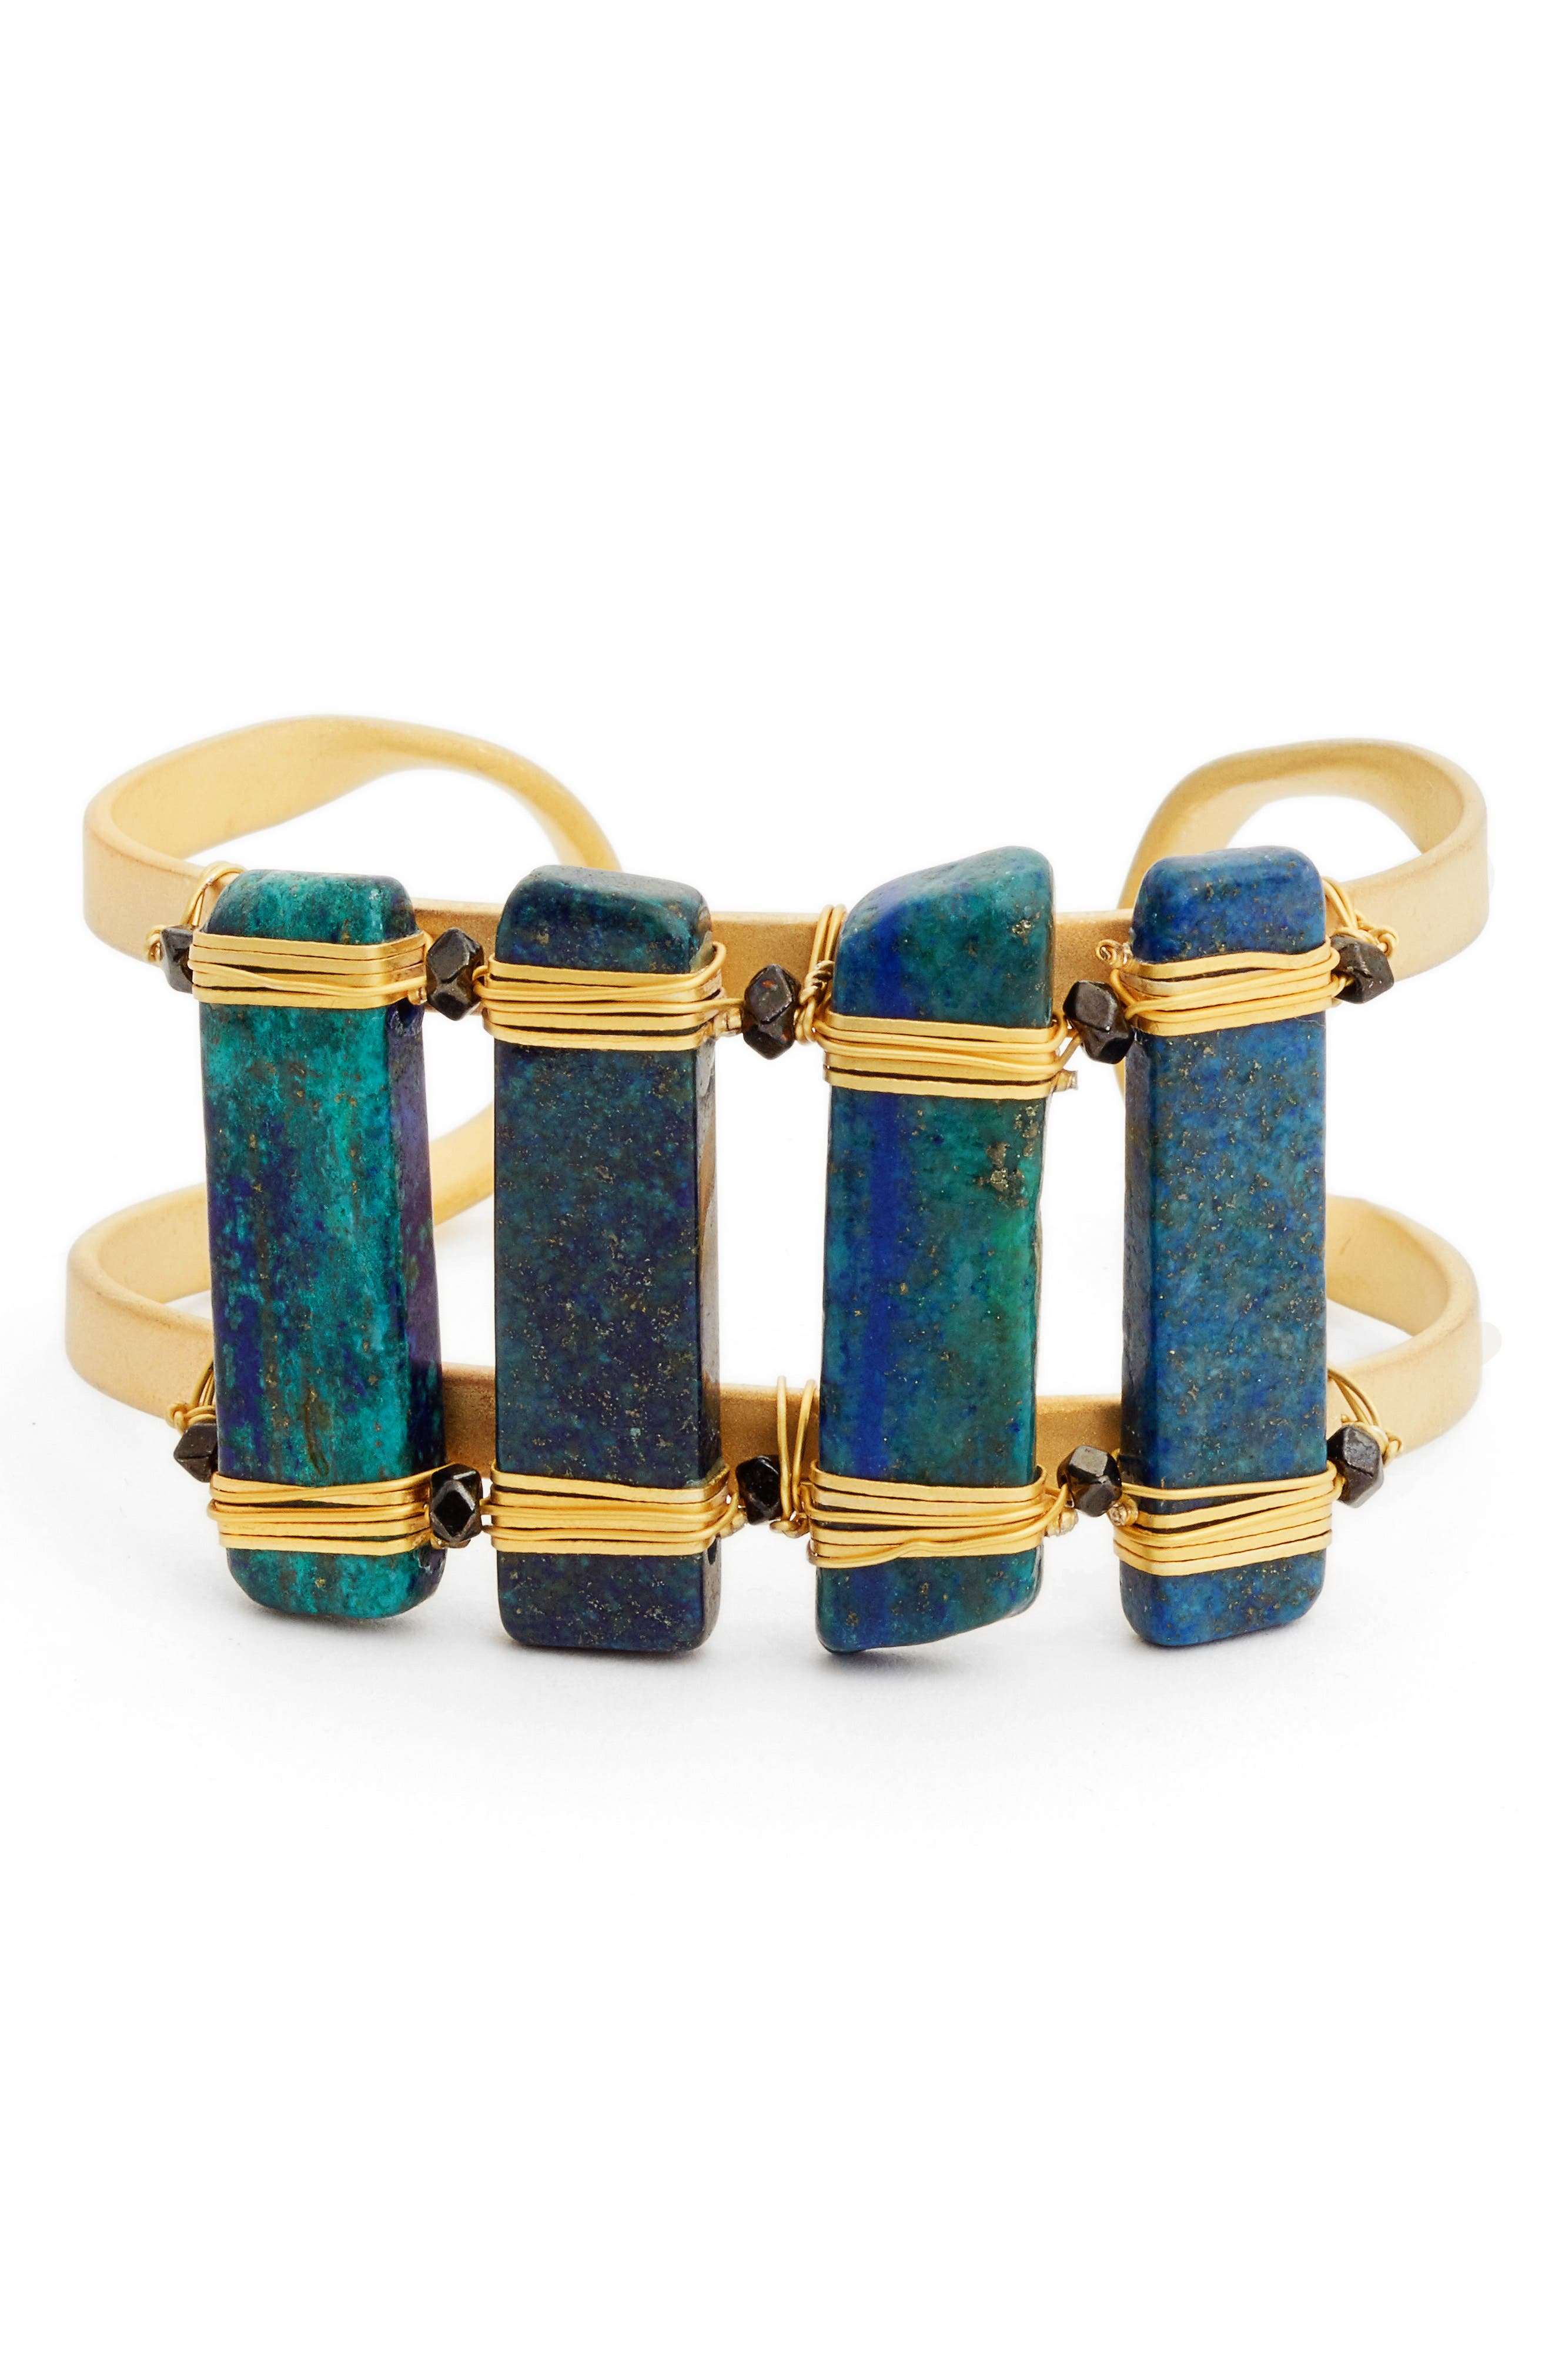 Main Image - Nakamol Design Ahlan Lapis Cuff Bracelet